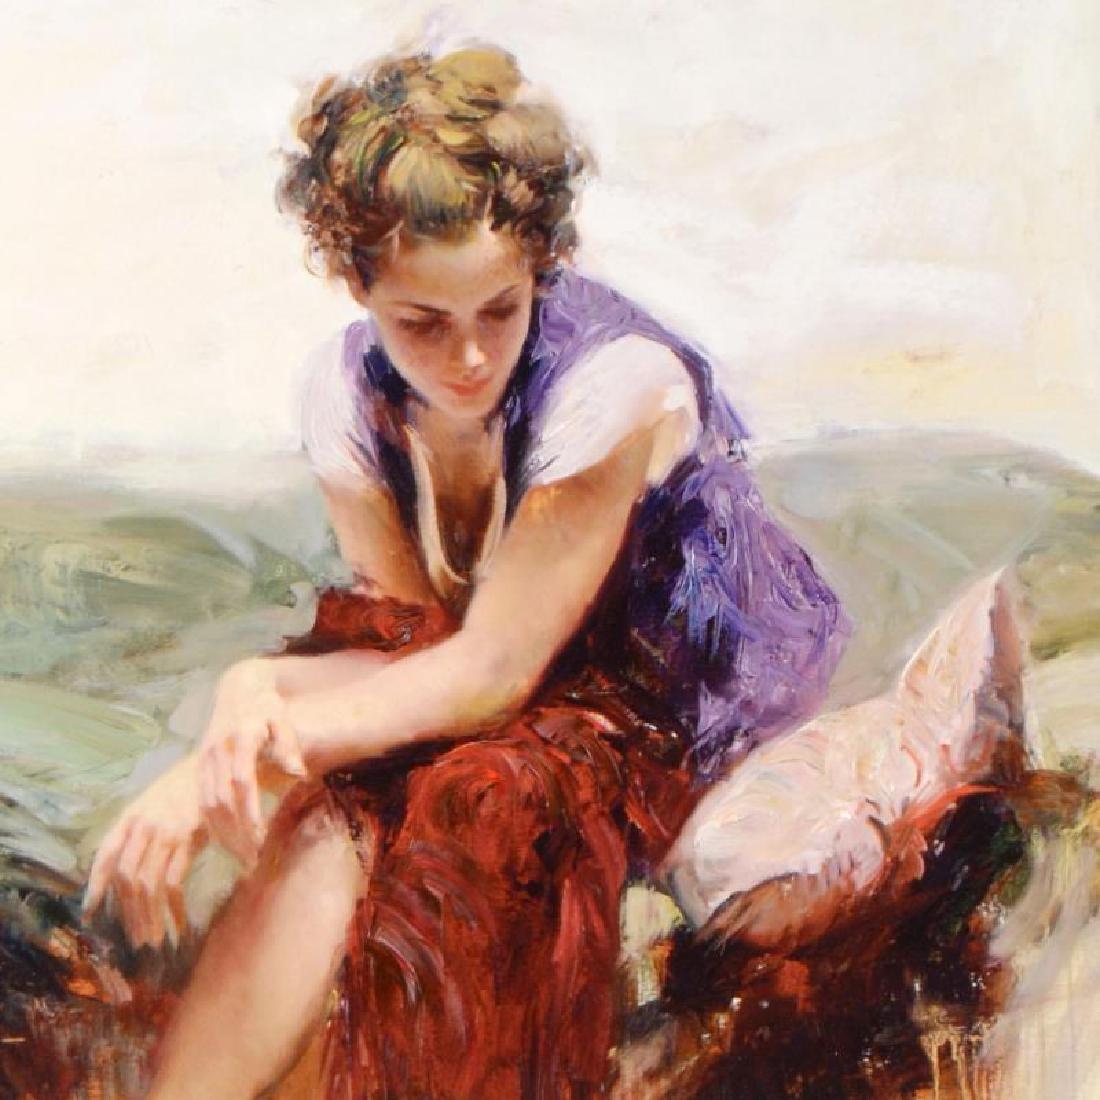 Francesca by Pino (1939-2010) - 2